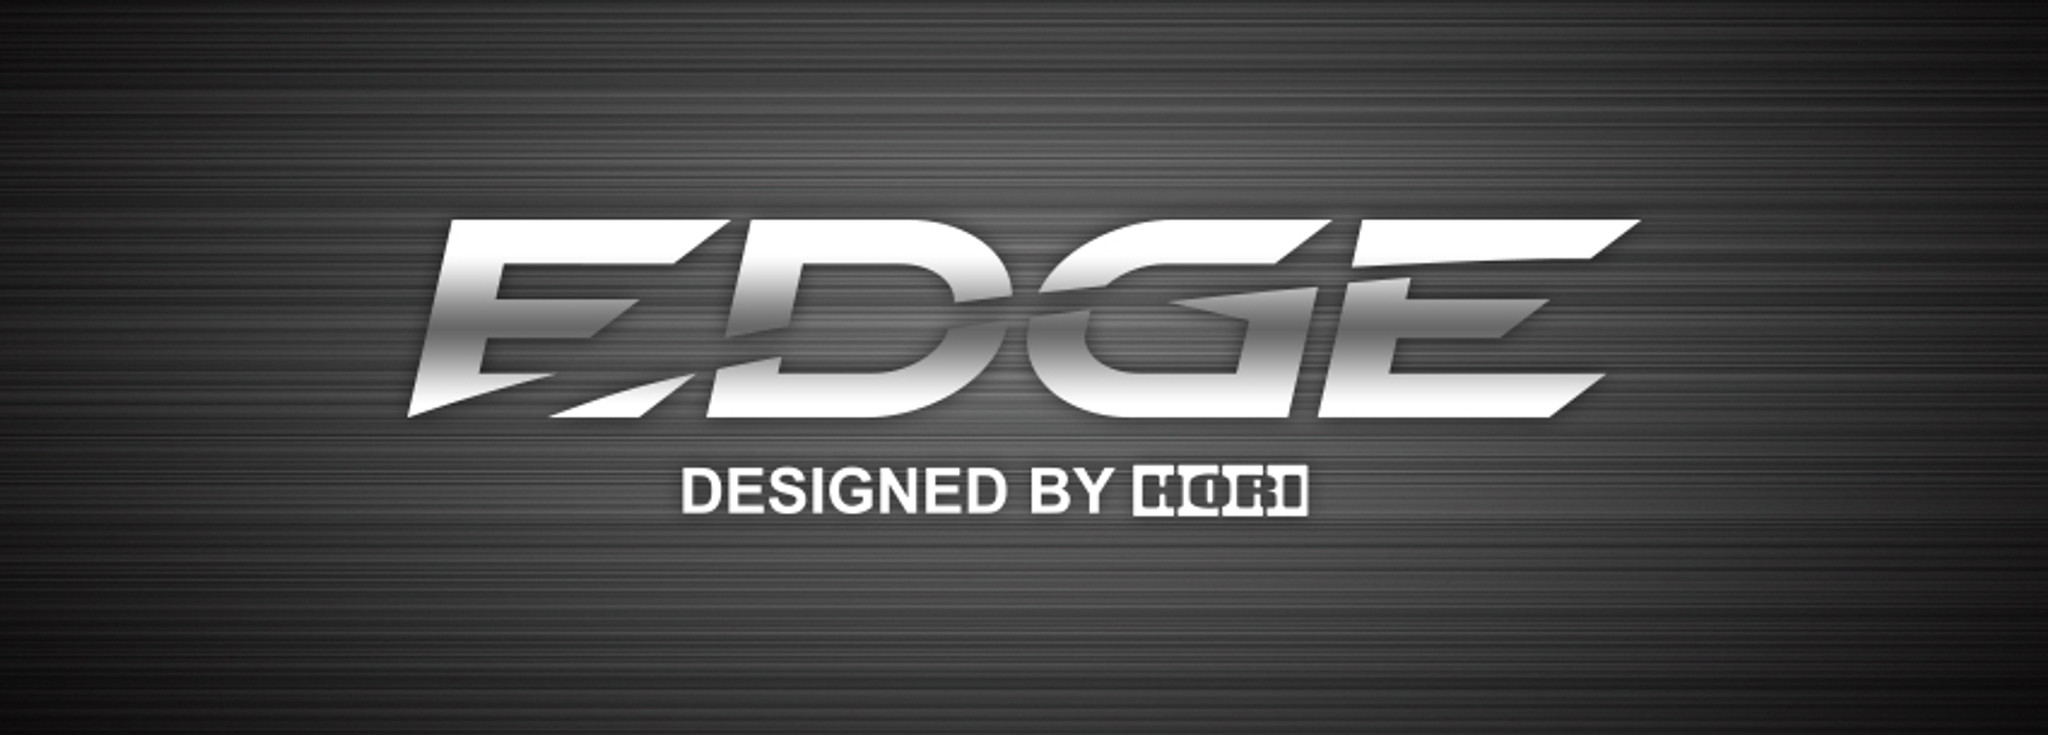 EDGE 201 Mechanical Gaming Keyboard